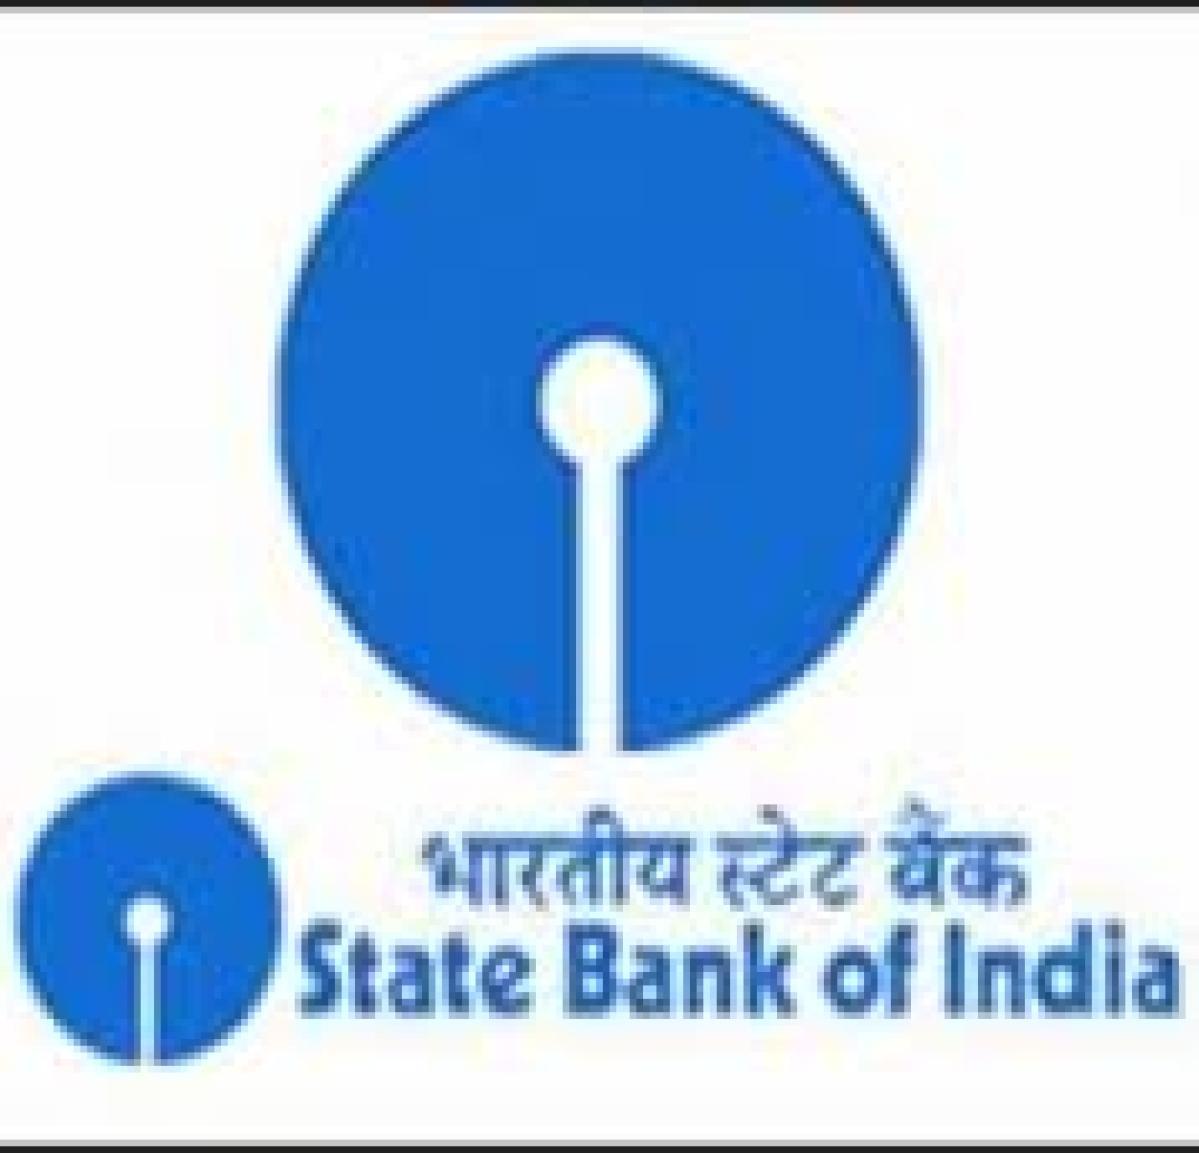 SBI raises 125 billion through international bond offering JSA Amarchand Linklaters and AampO advise